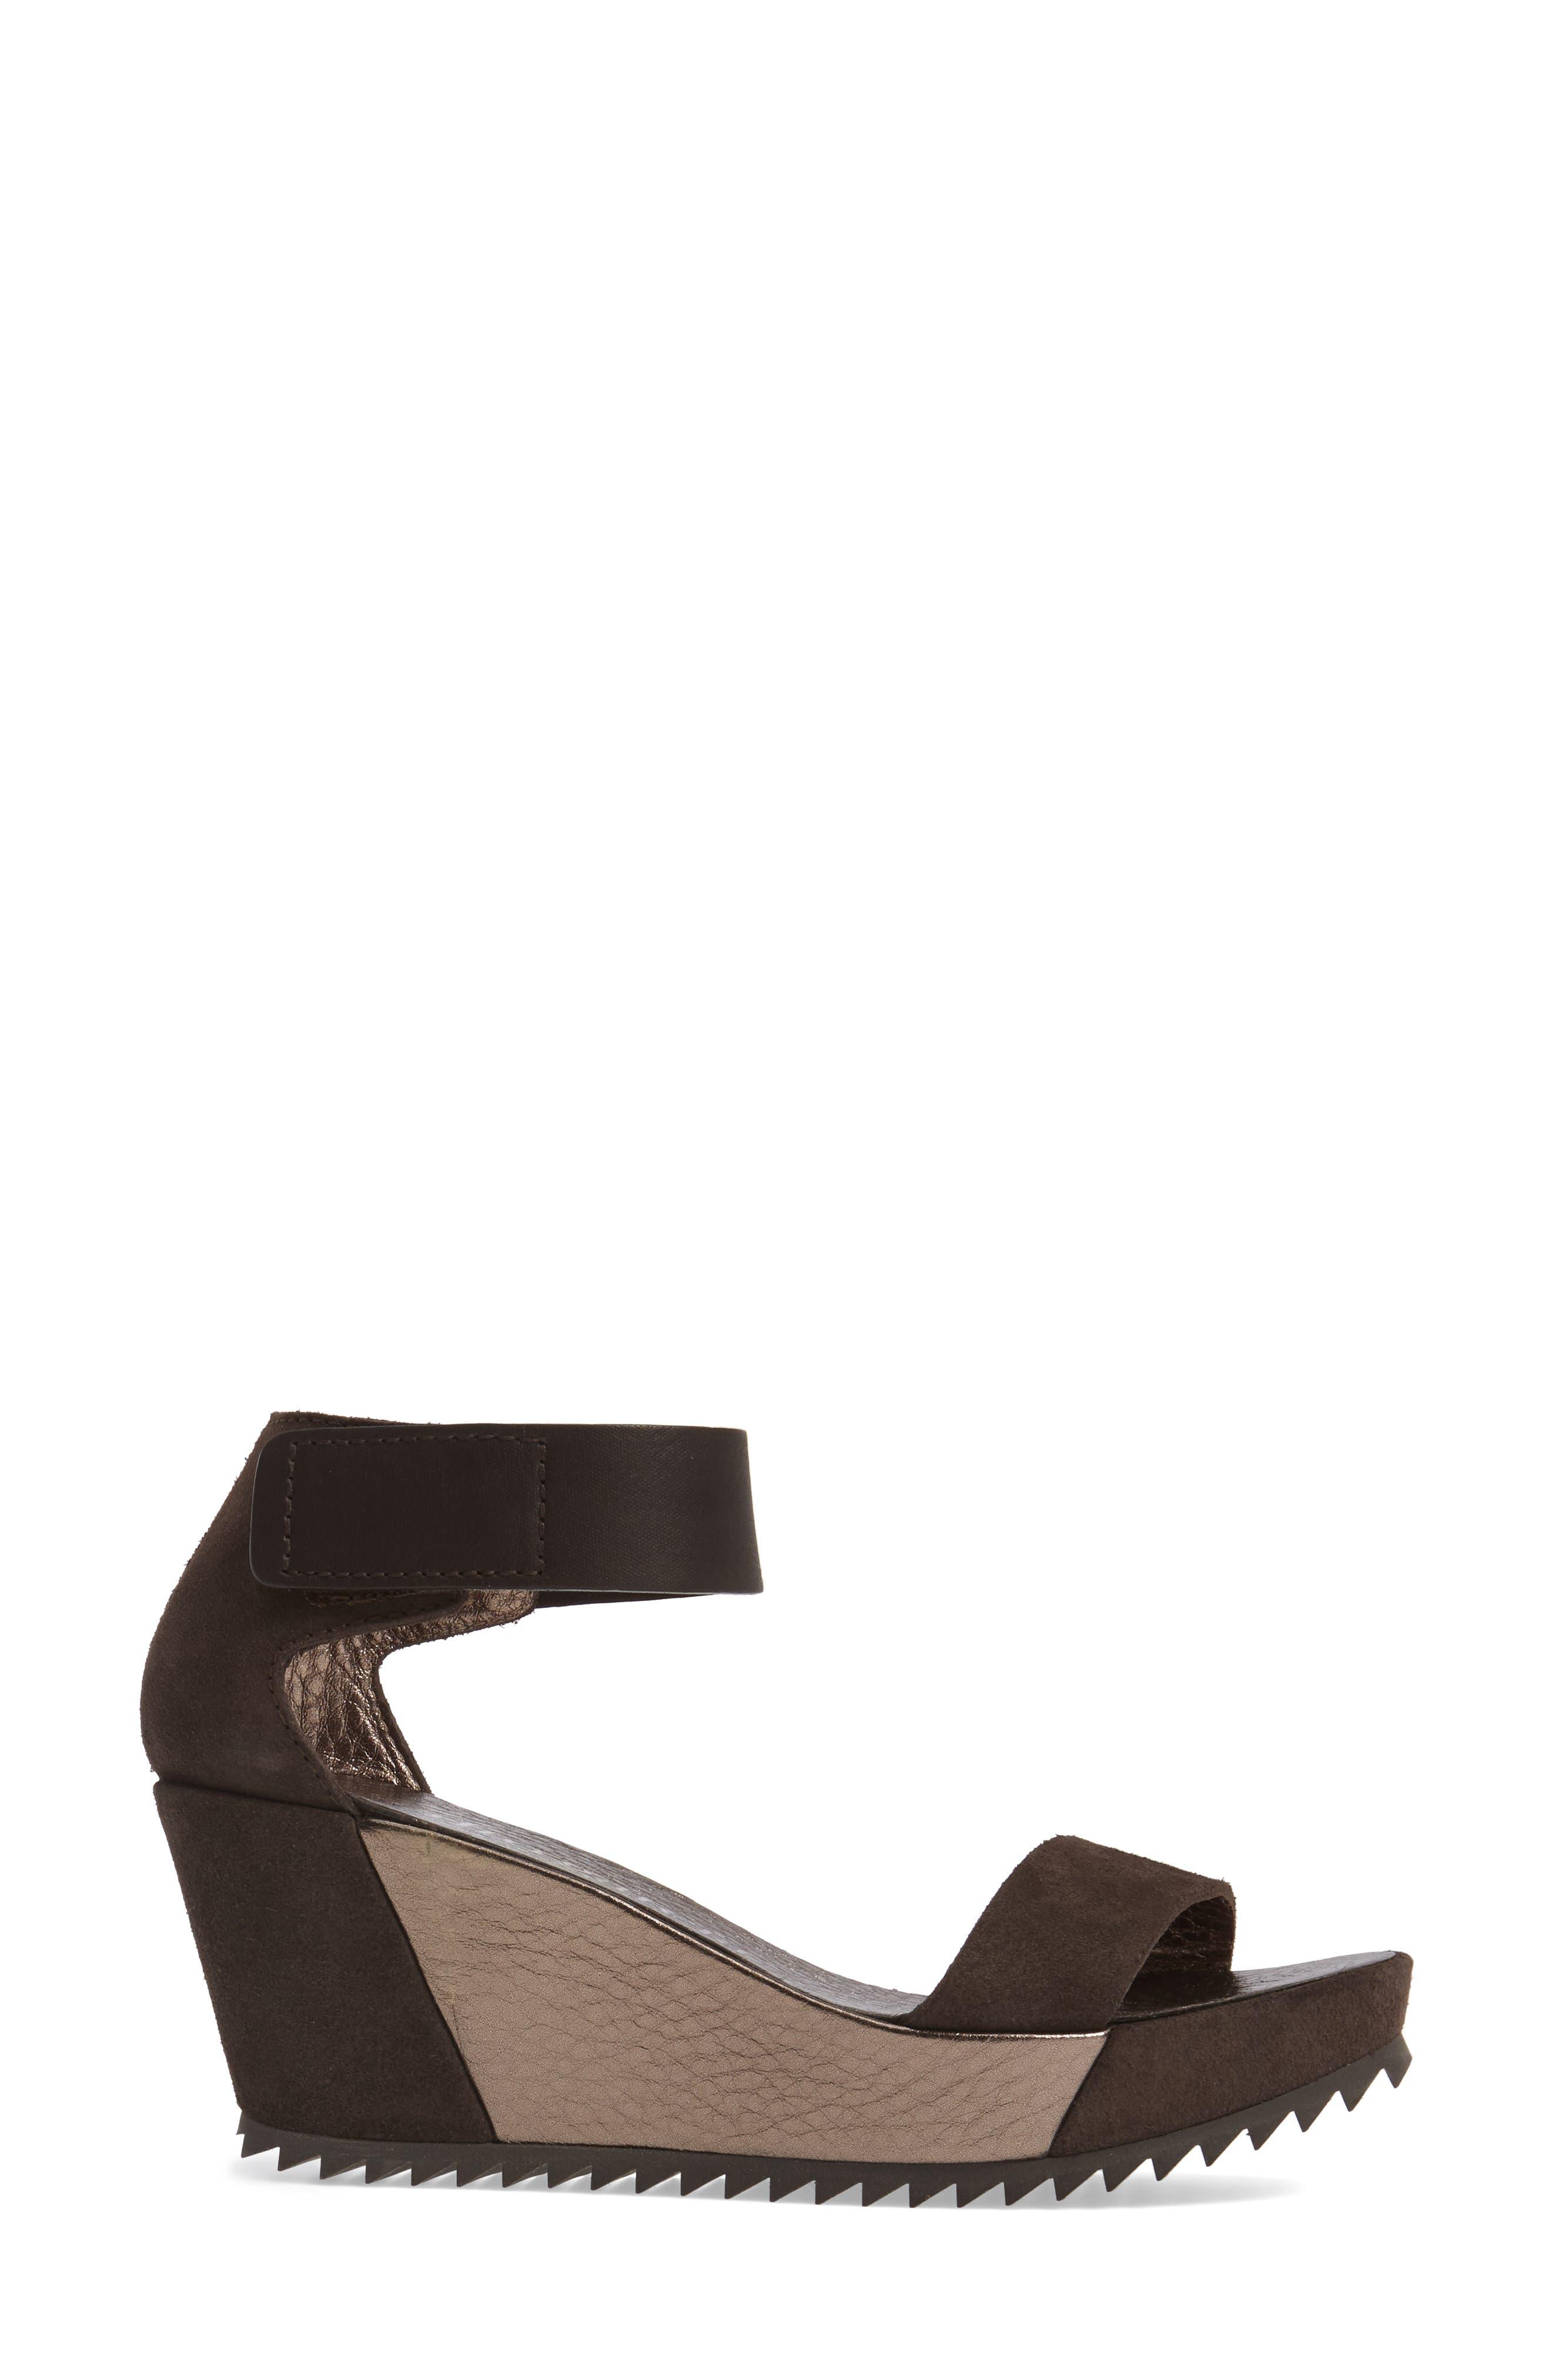 Fidelia Wedge Sandal,                             Alternate thumbnail 6, color,